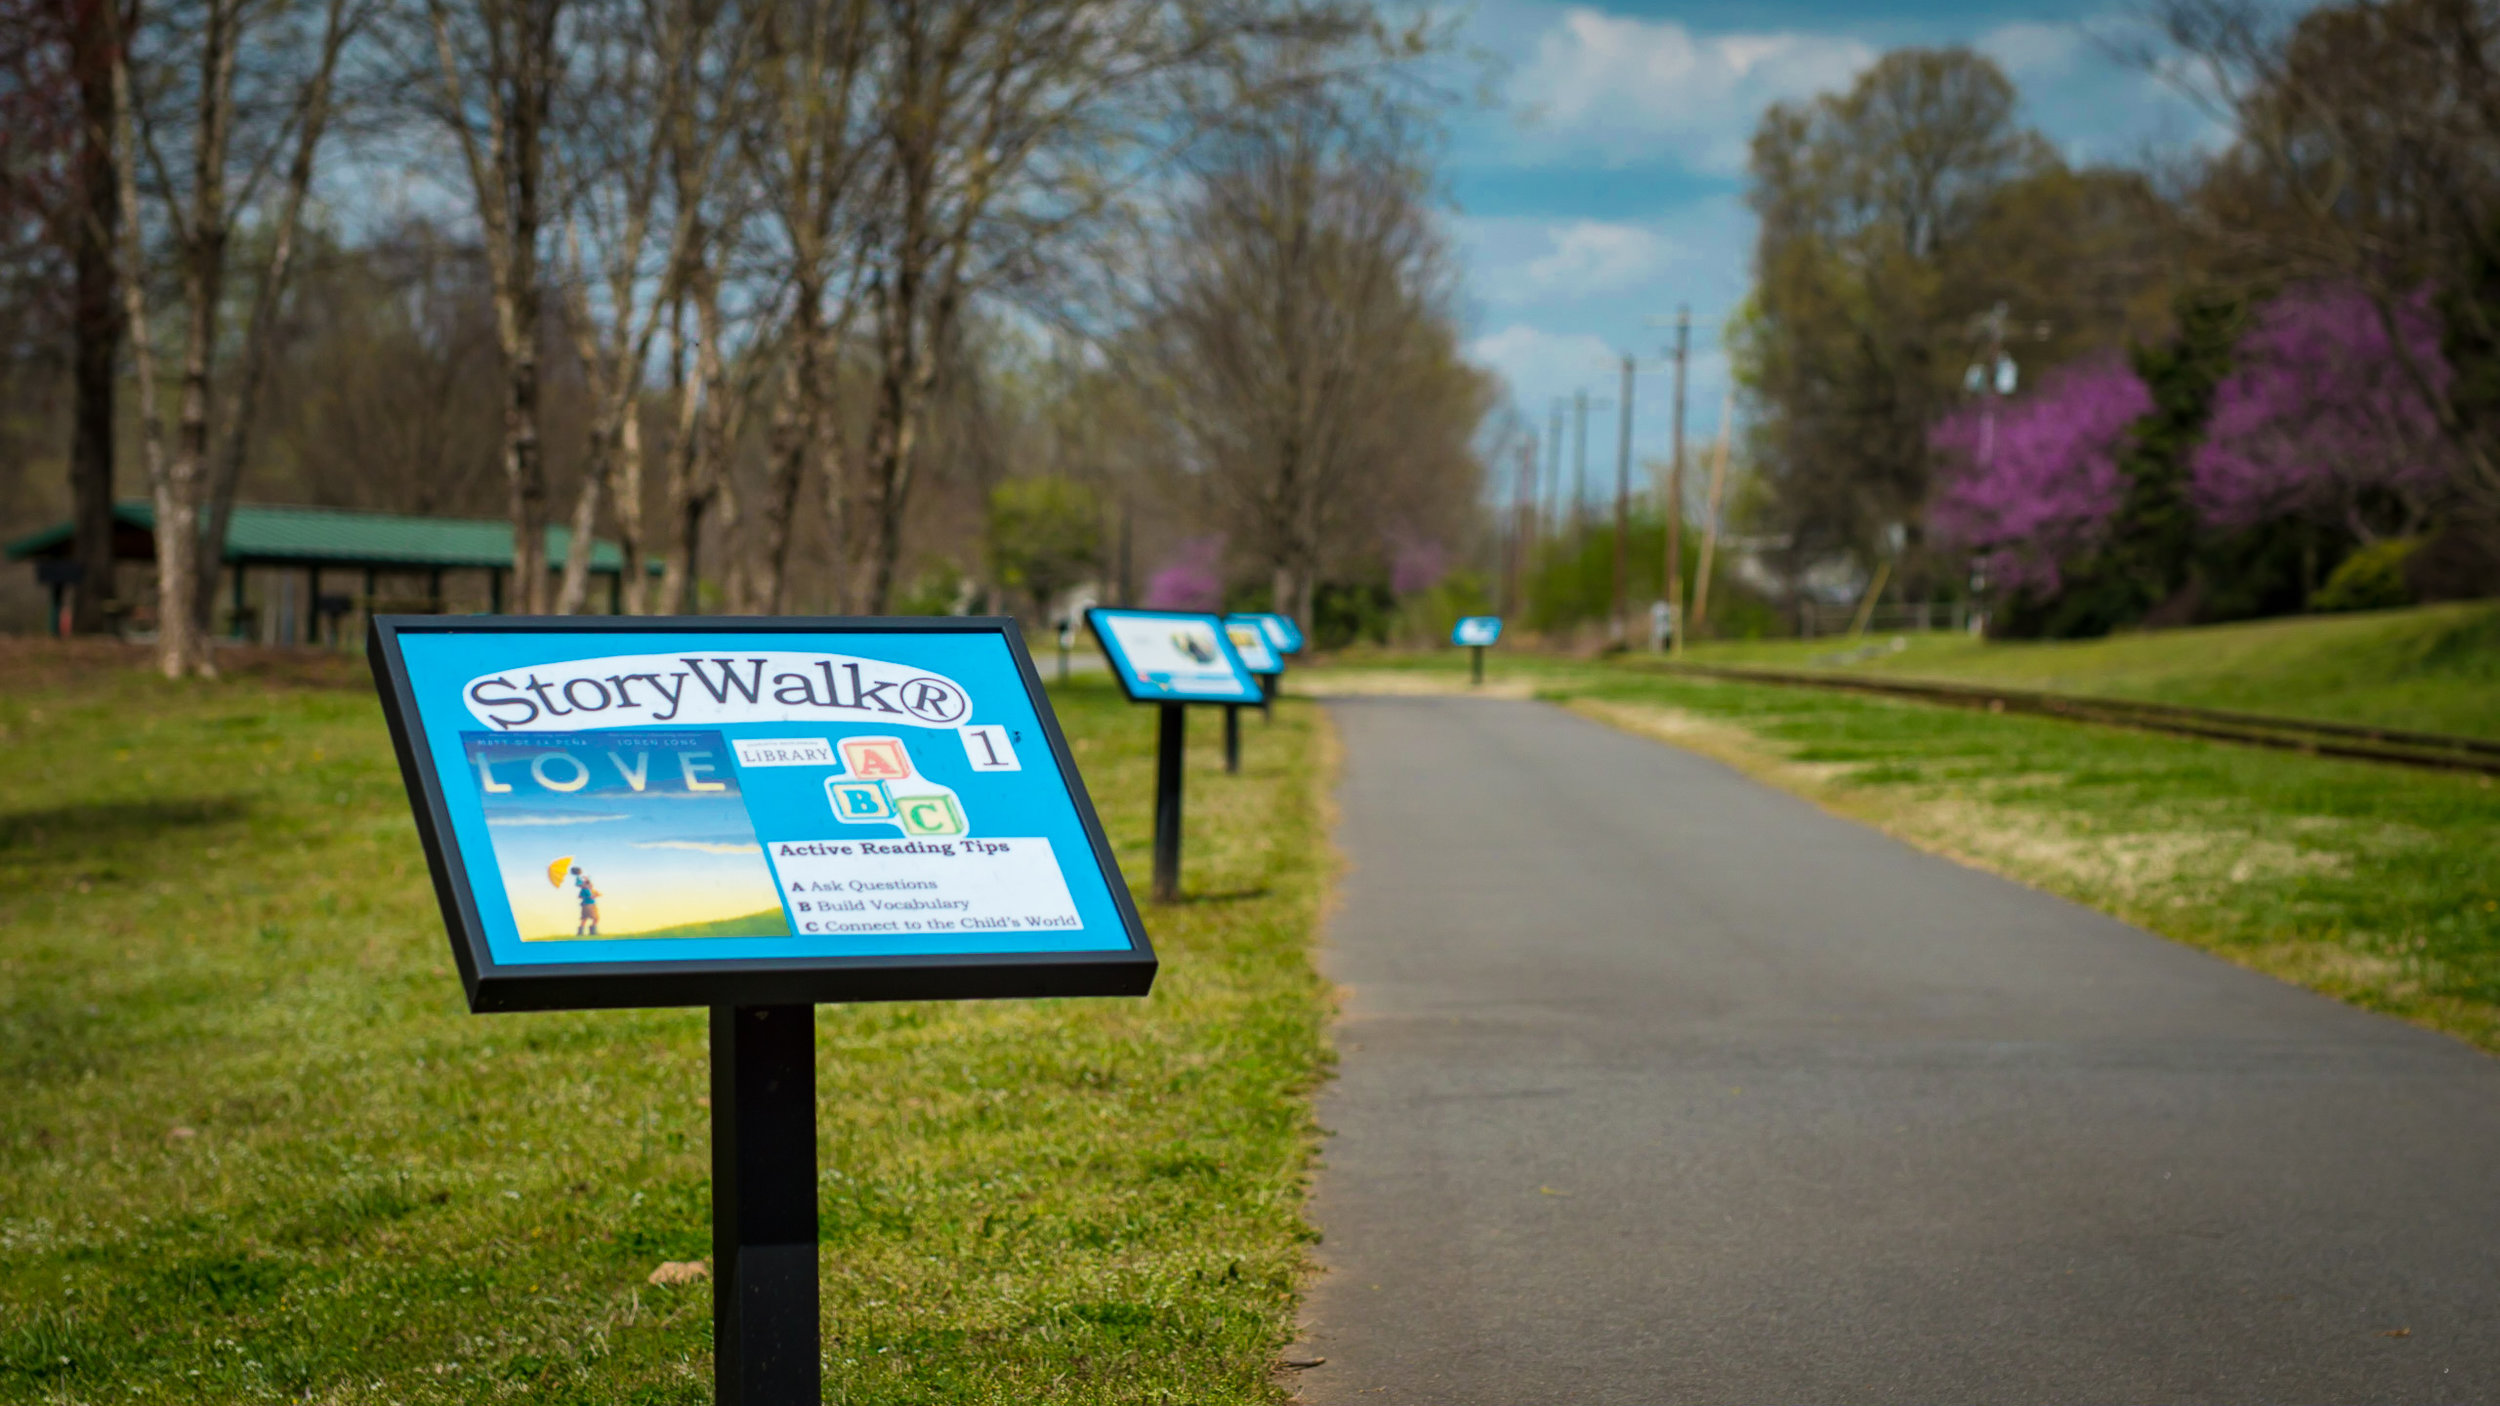 Story Walk Wesley Heights Green-way